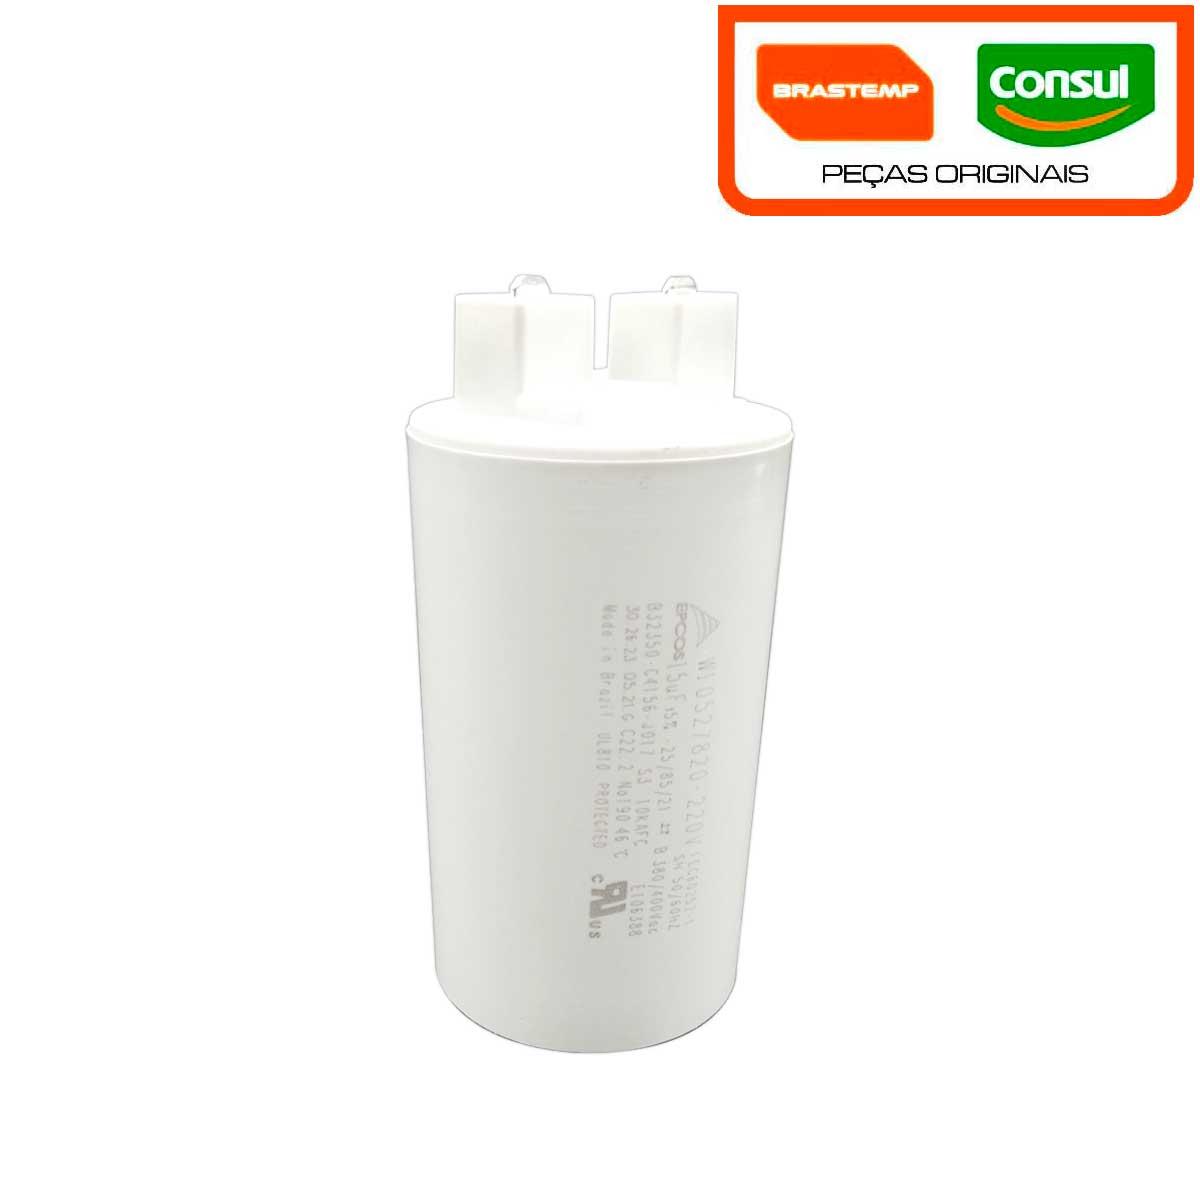 Agrupador Capacitor Brastemp Consul 220V W10819784